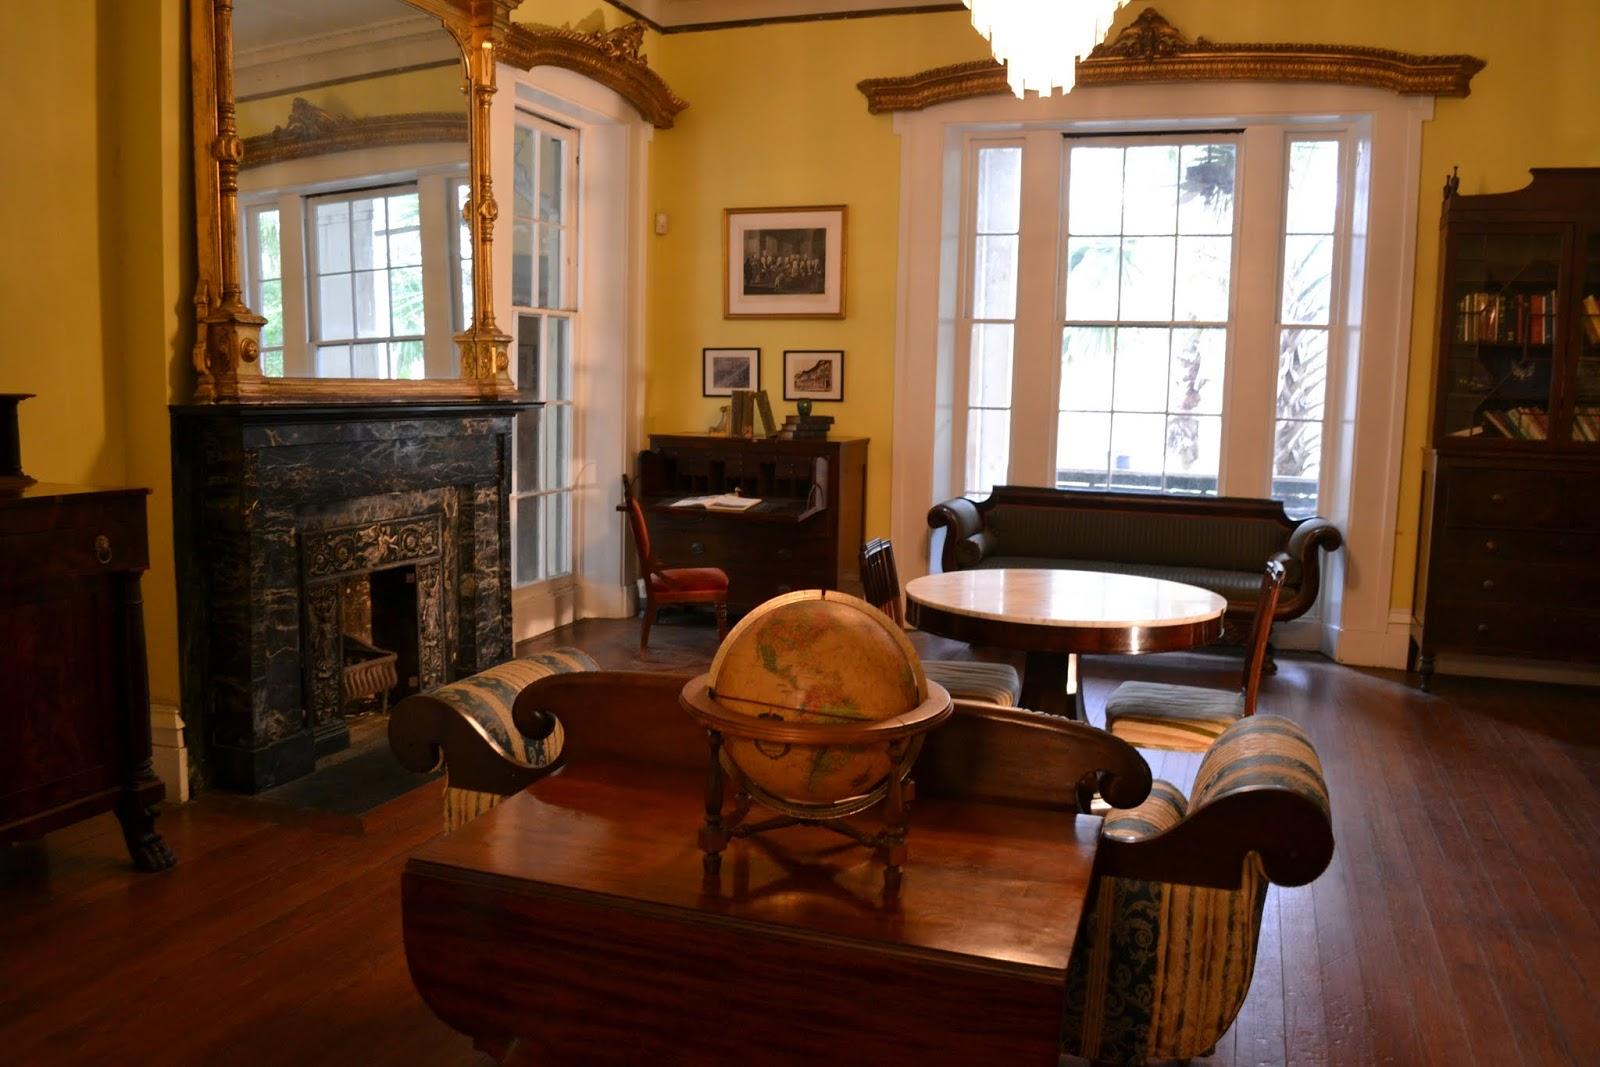 Дом-музей Френсиса Соррела. Саванна, Джорджия (Sorrel-Weed Mansion, Savannah, Georgia)